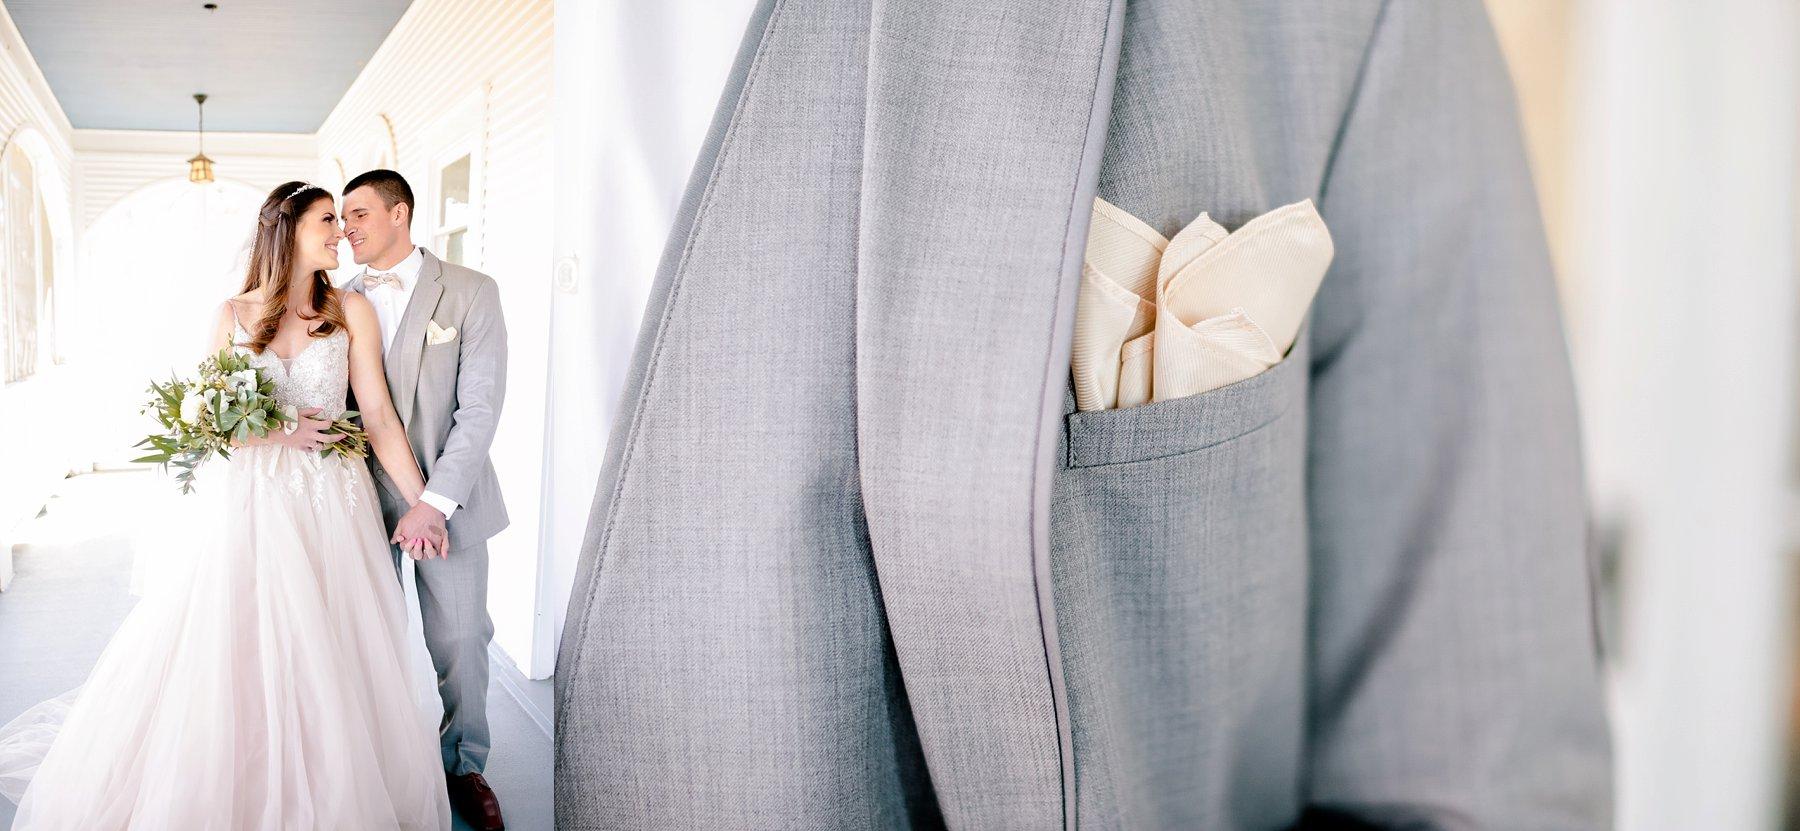 photographer_wedding_saint_louis_Kansas_City_Photography_Videography_workshop_training_styled_engagement_Lake_Ozark_KC_MO_STL_Rolla_Hermann_Saint_James_0431.jpg